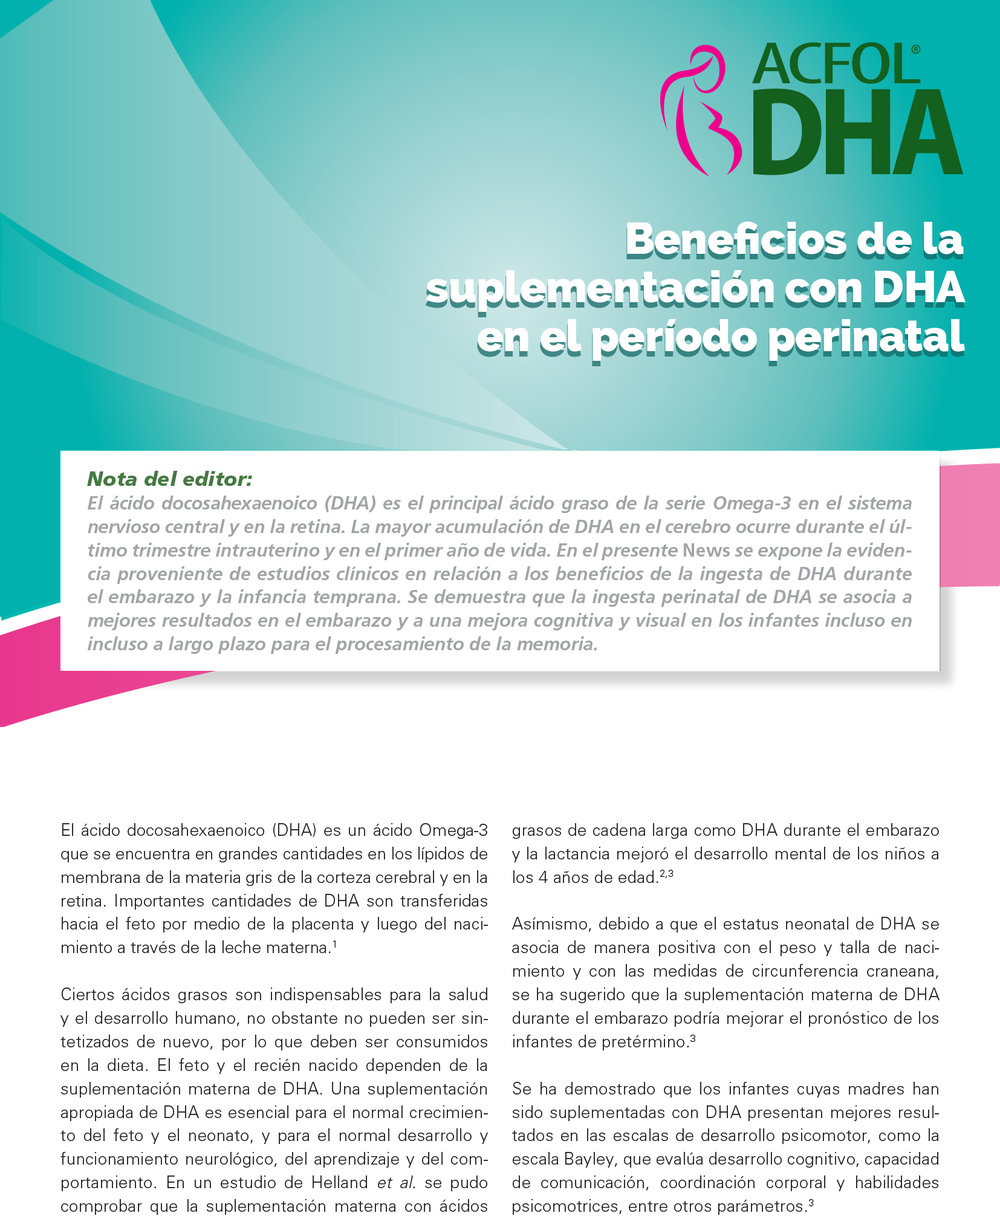 NEWS_1_DHA_5802_v5_HON[1]-1.jpg